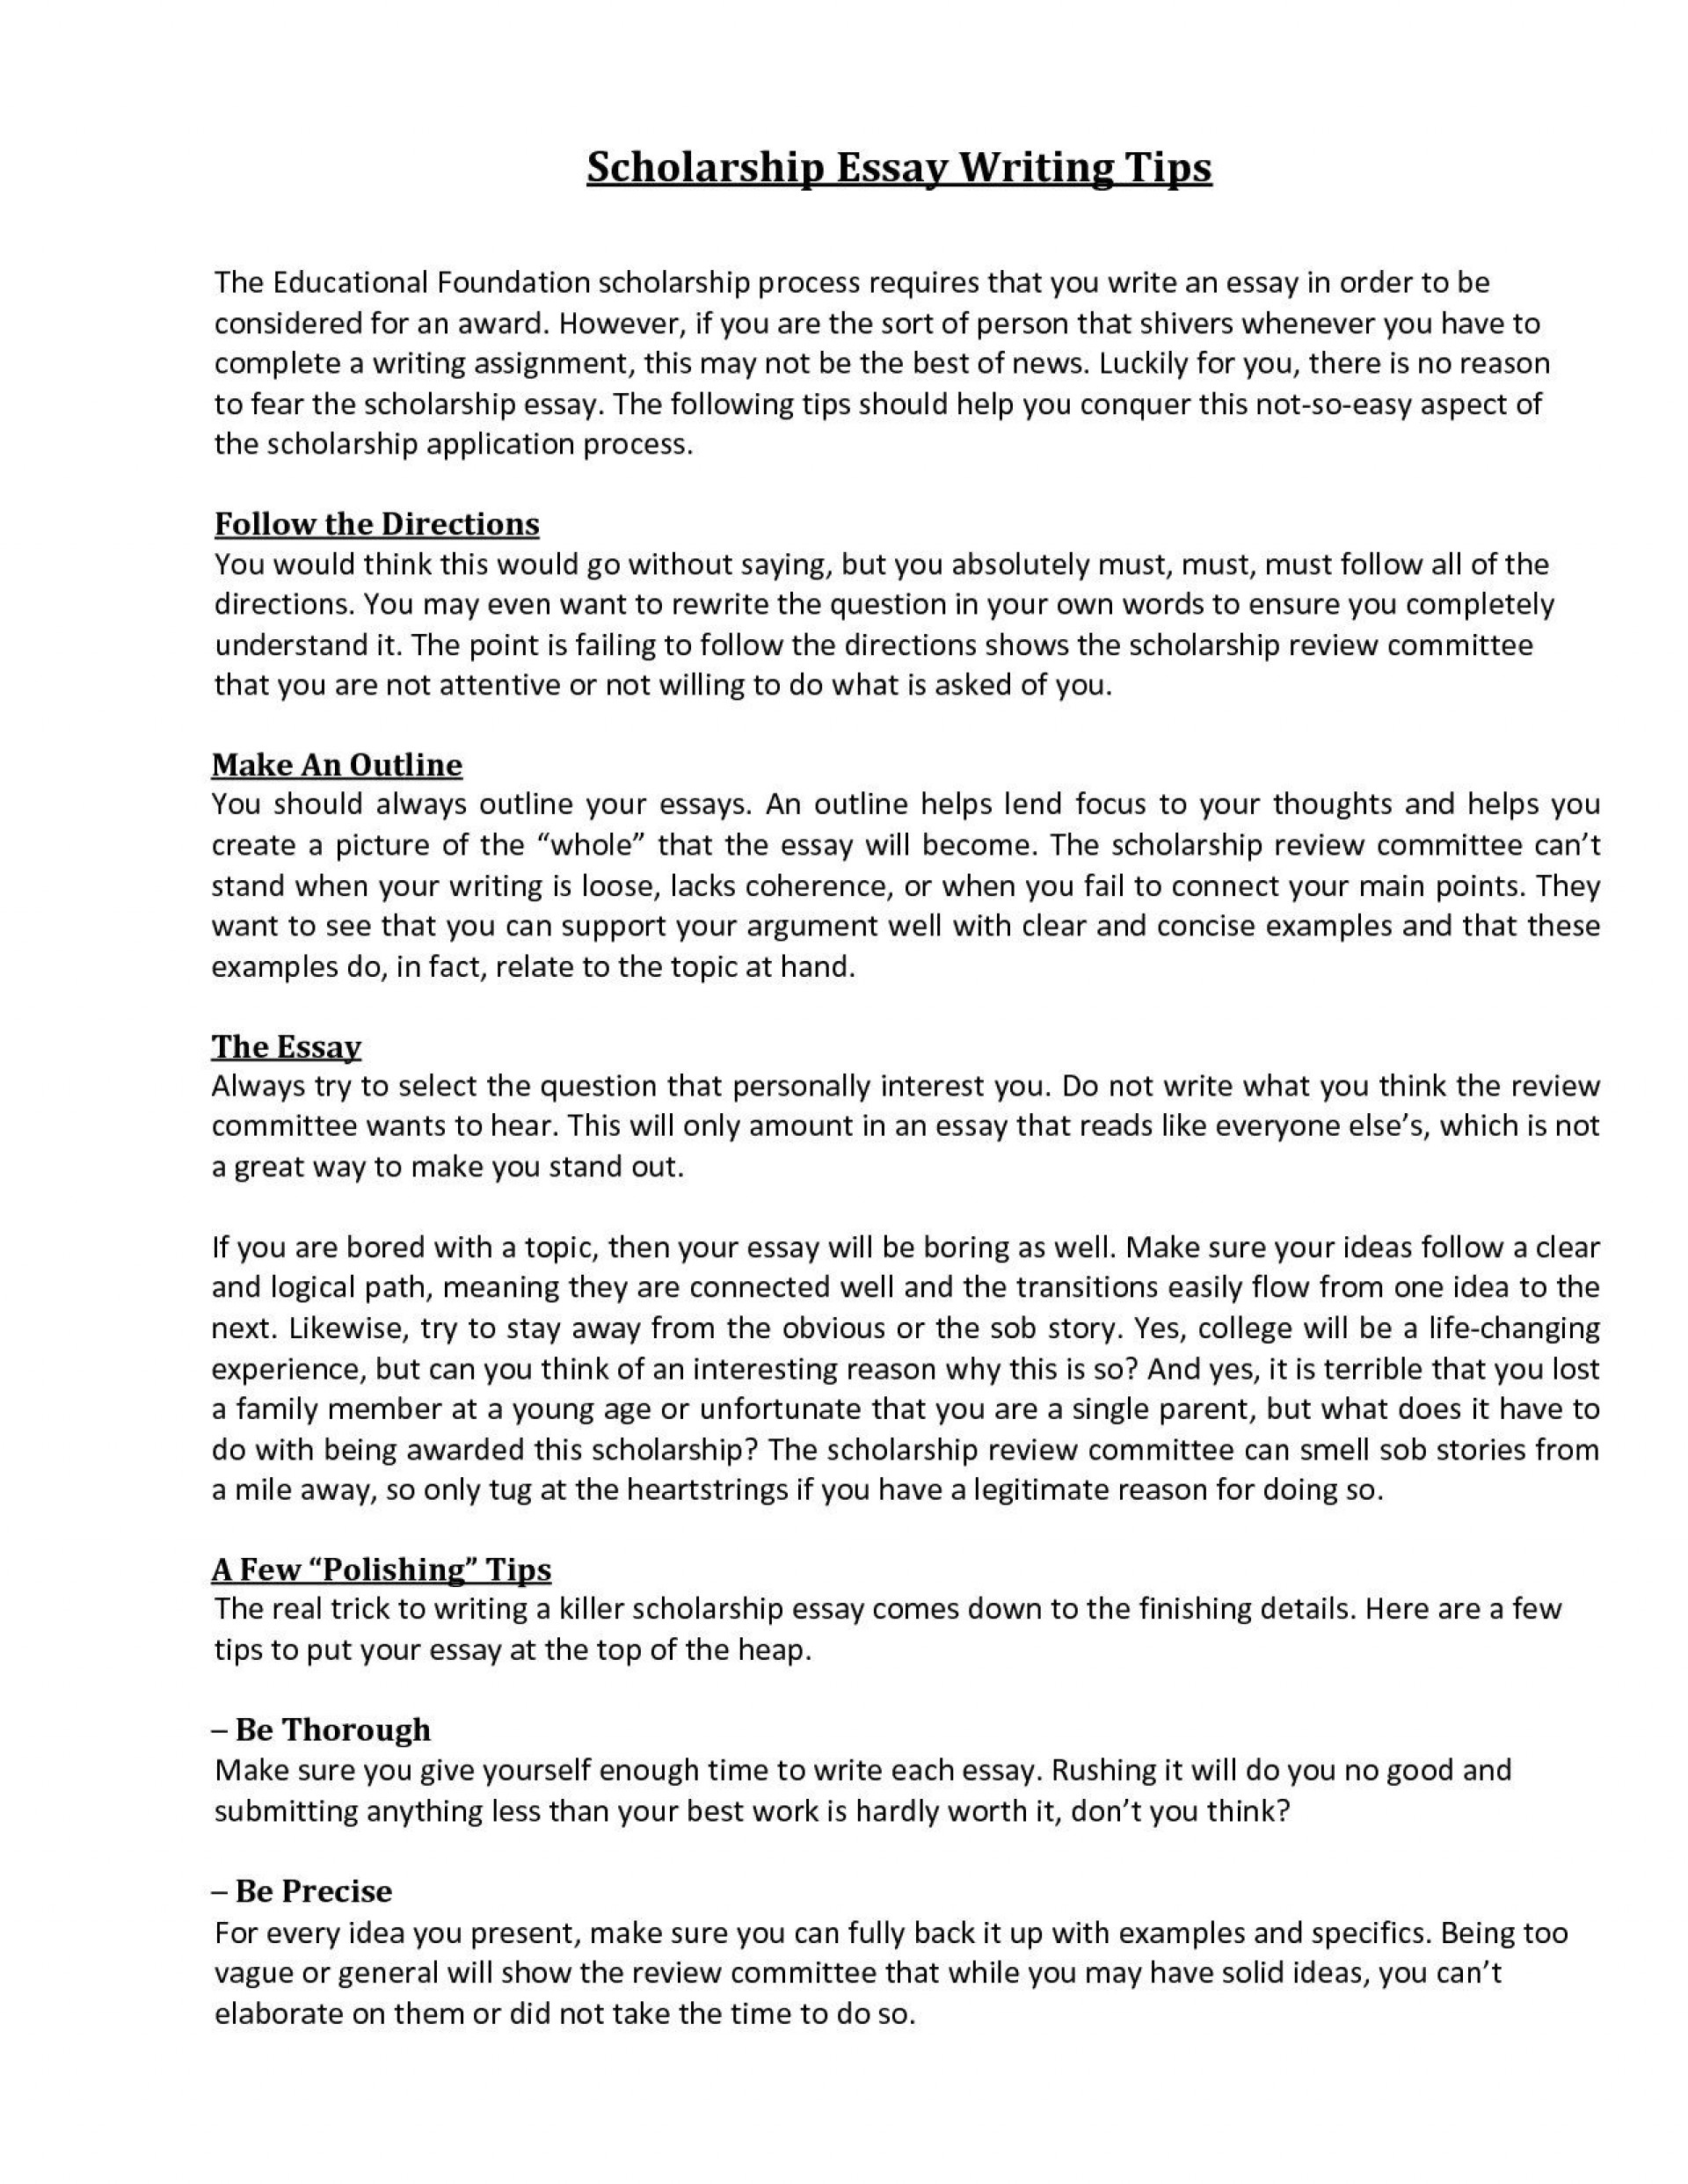 006 Sample Essay For Scholarship Example Incredible Mara Personal Pdf 1920